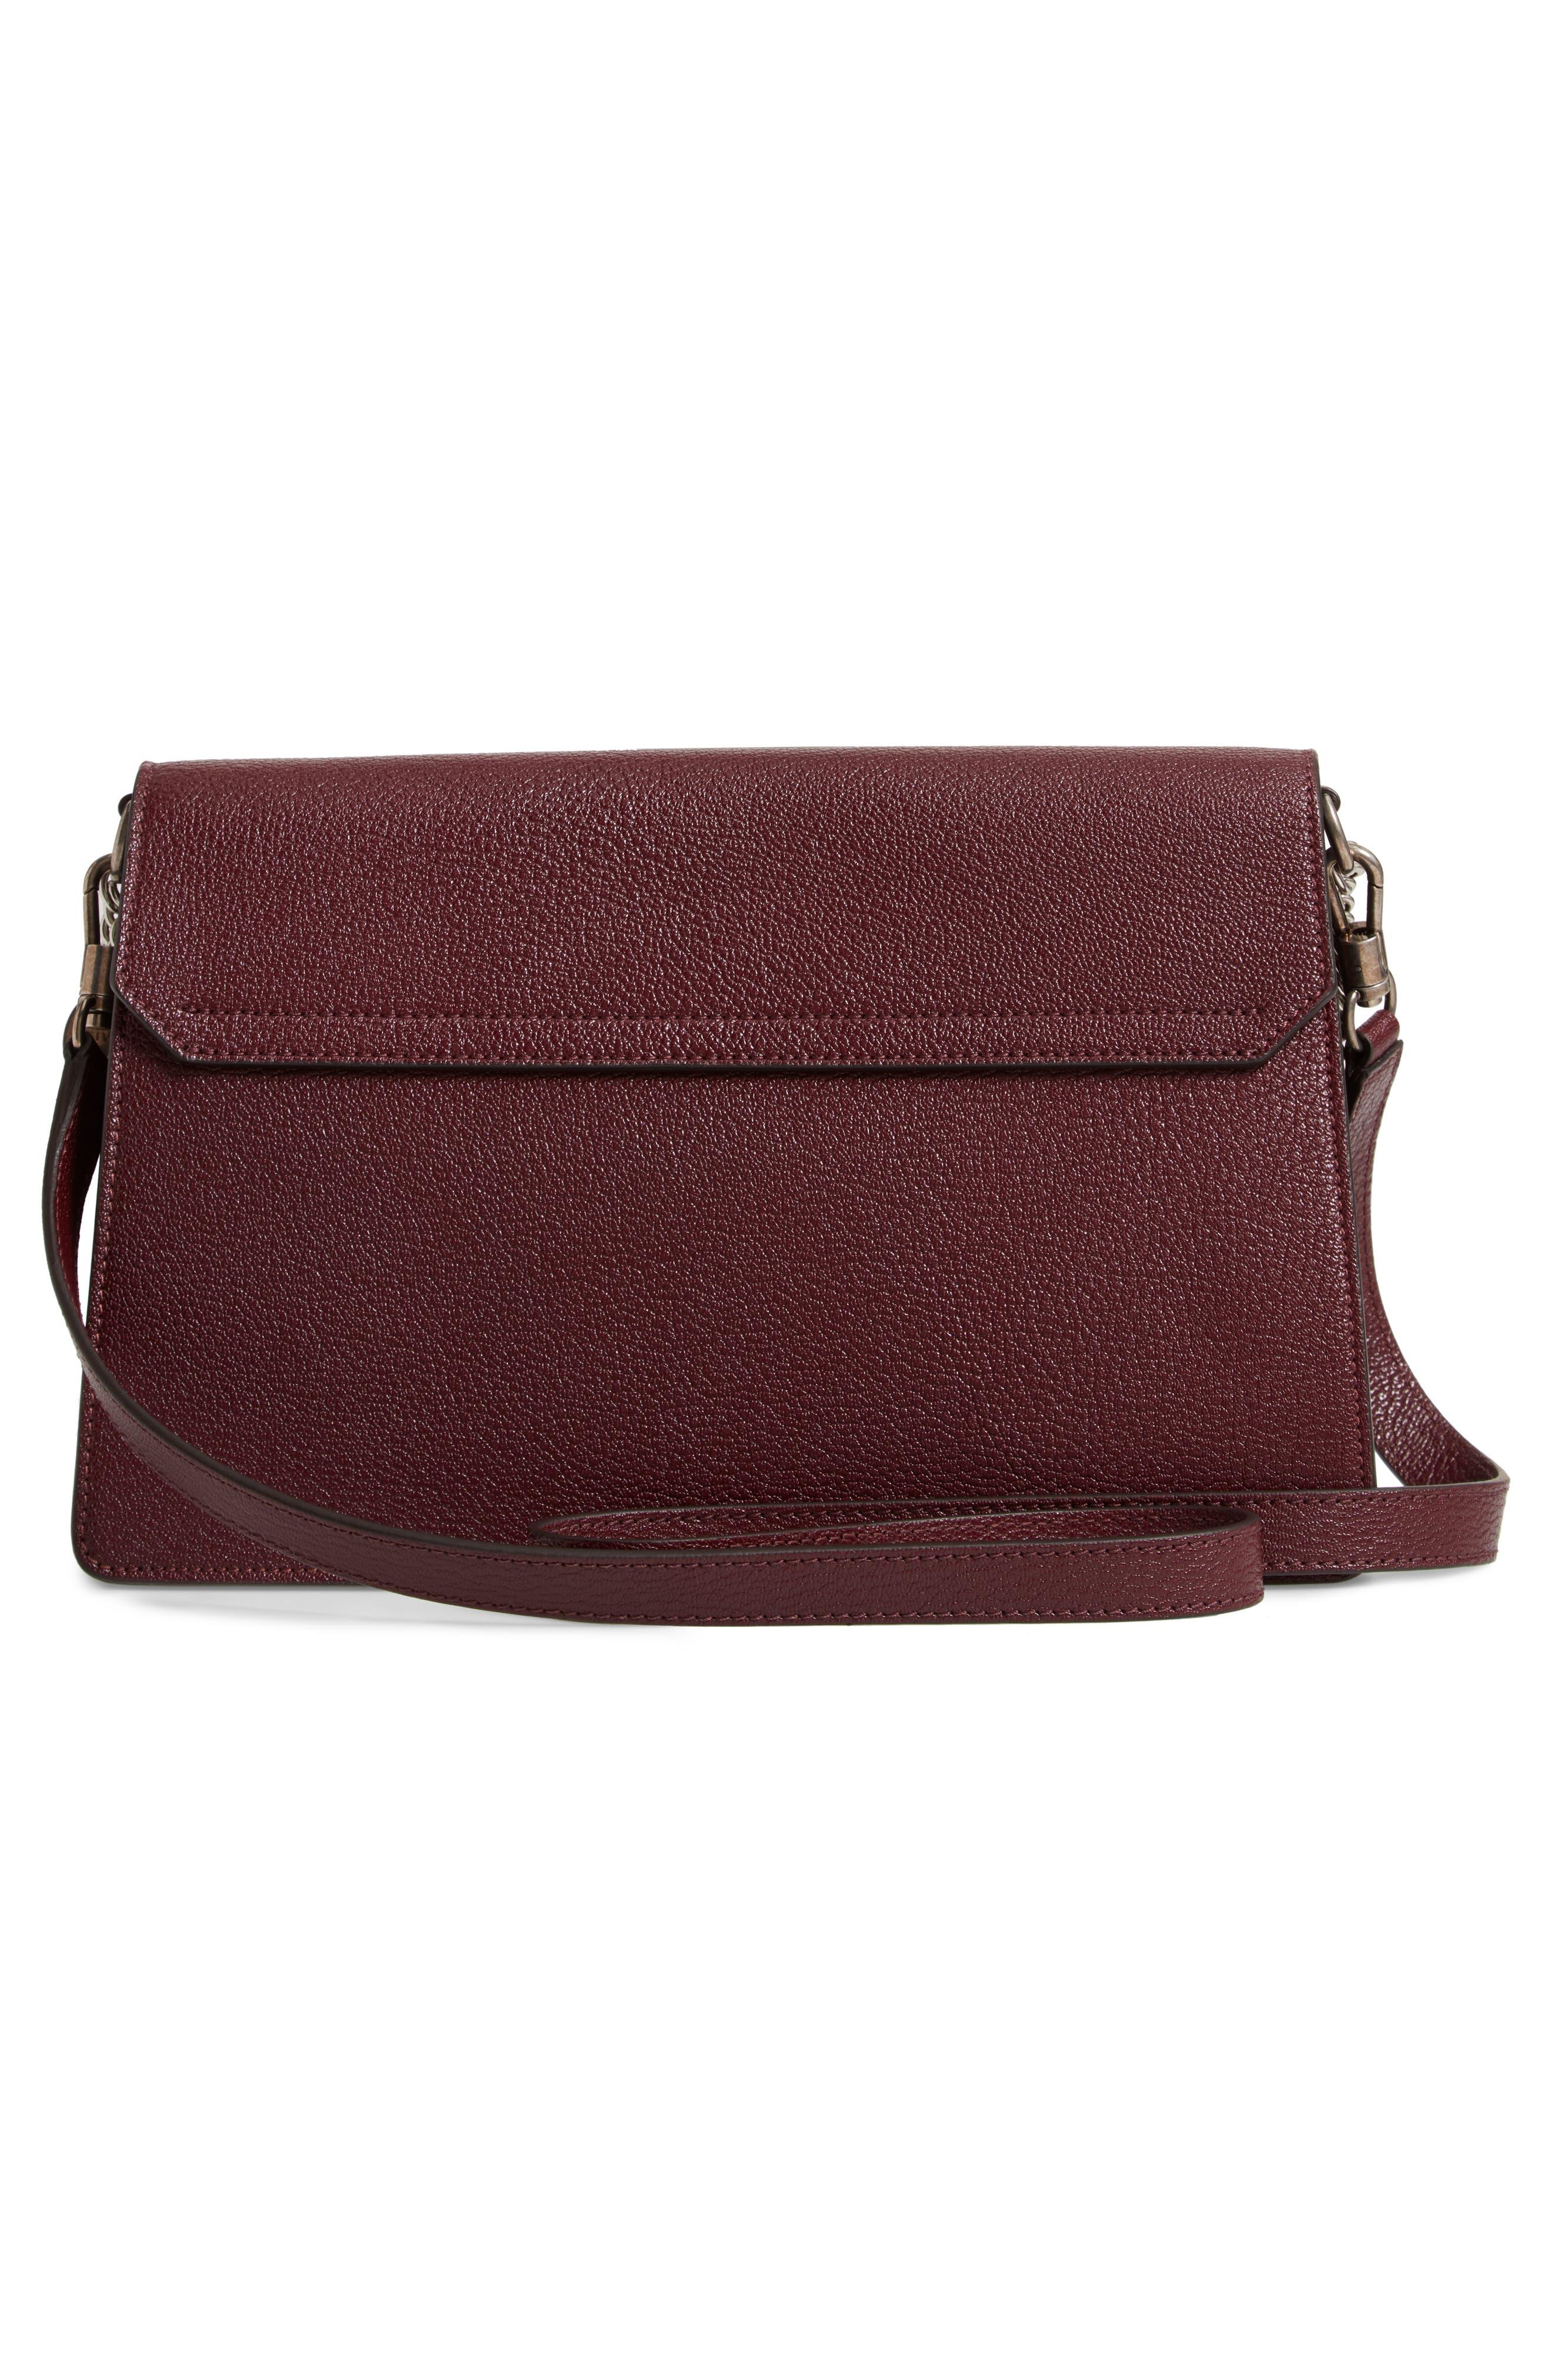 GV3 Goatskin Leather Shoulder Bag,                             Alternate thumbnail 3, color,                             Aubergine